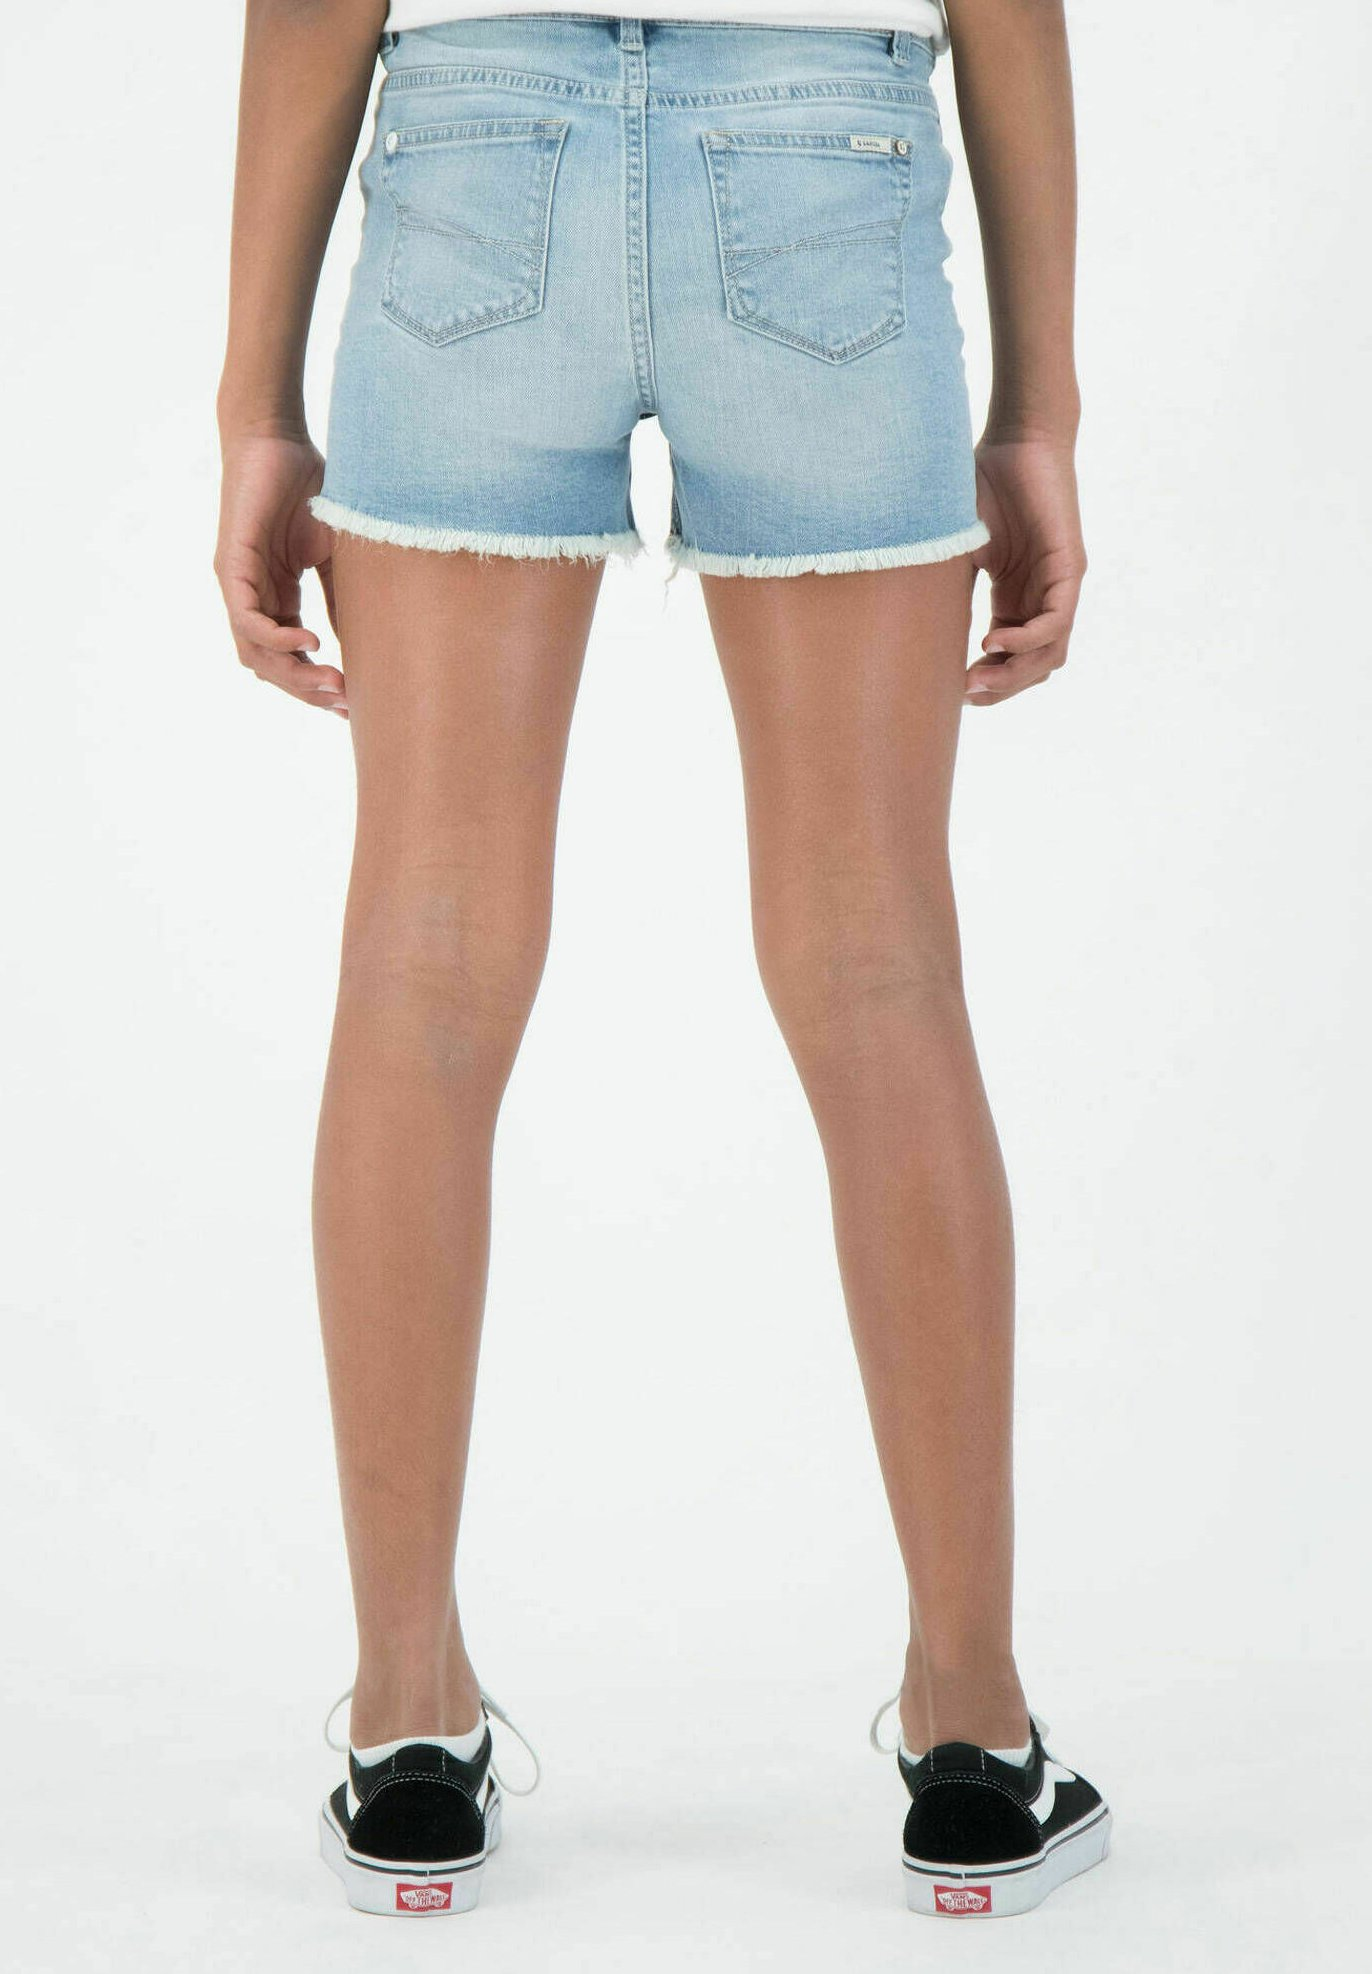 Kinder RIANNA - Jeans Shorts - stoned blue